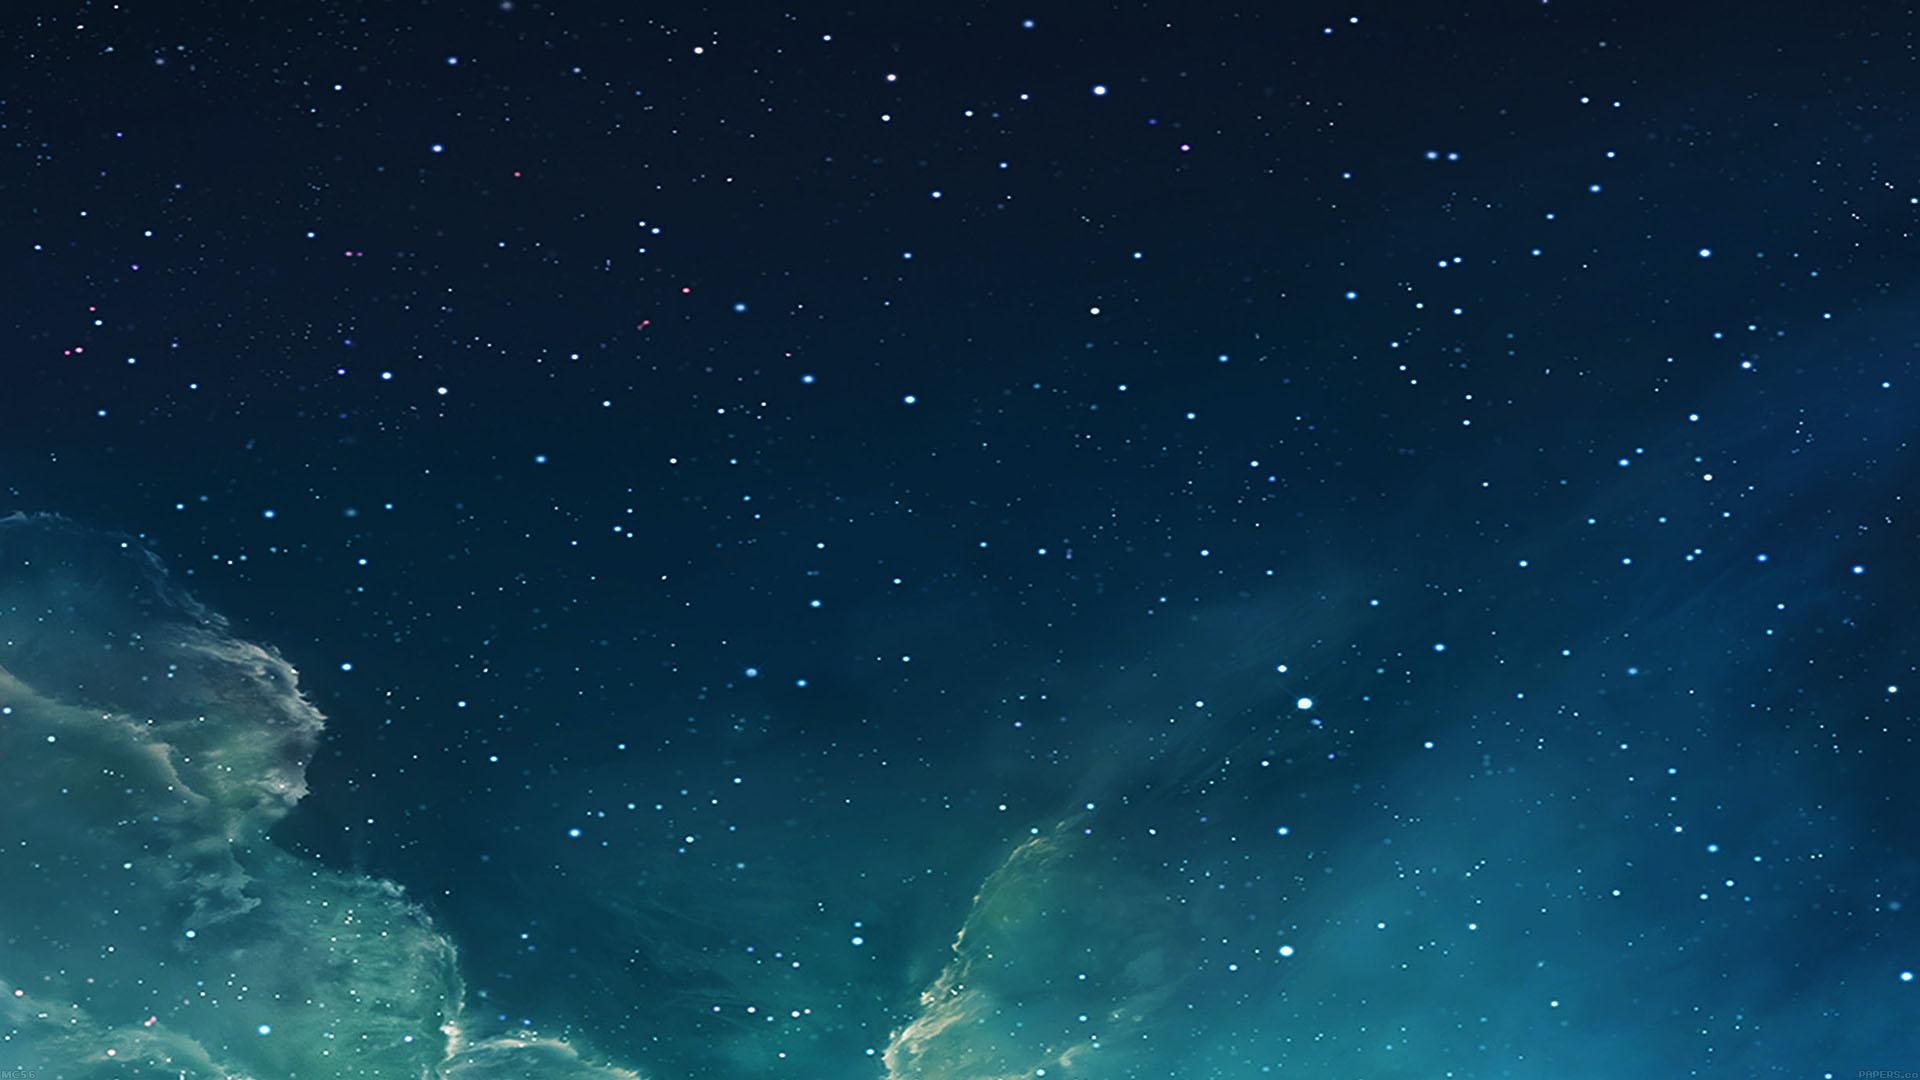 Mc56 Wallpaper Galaxy Blue 7 Starry Star Sky Wallpaper